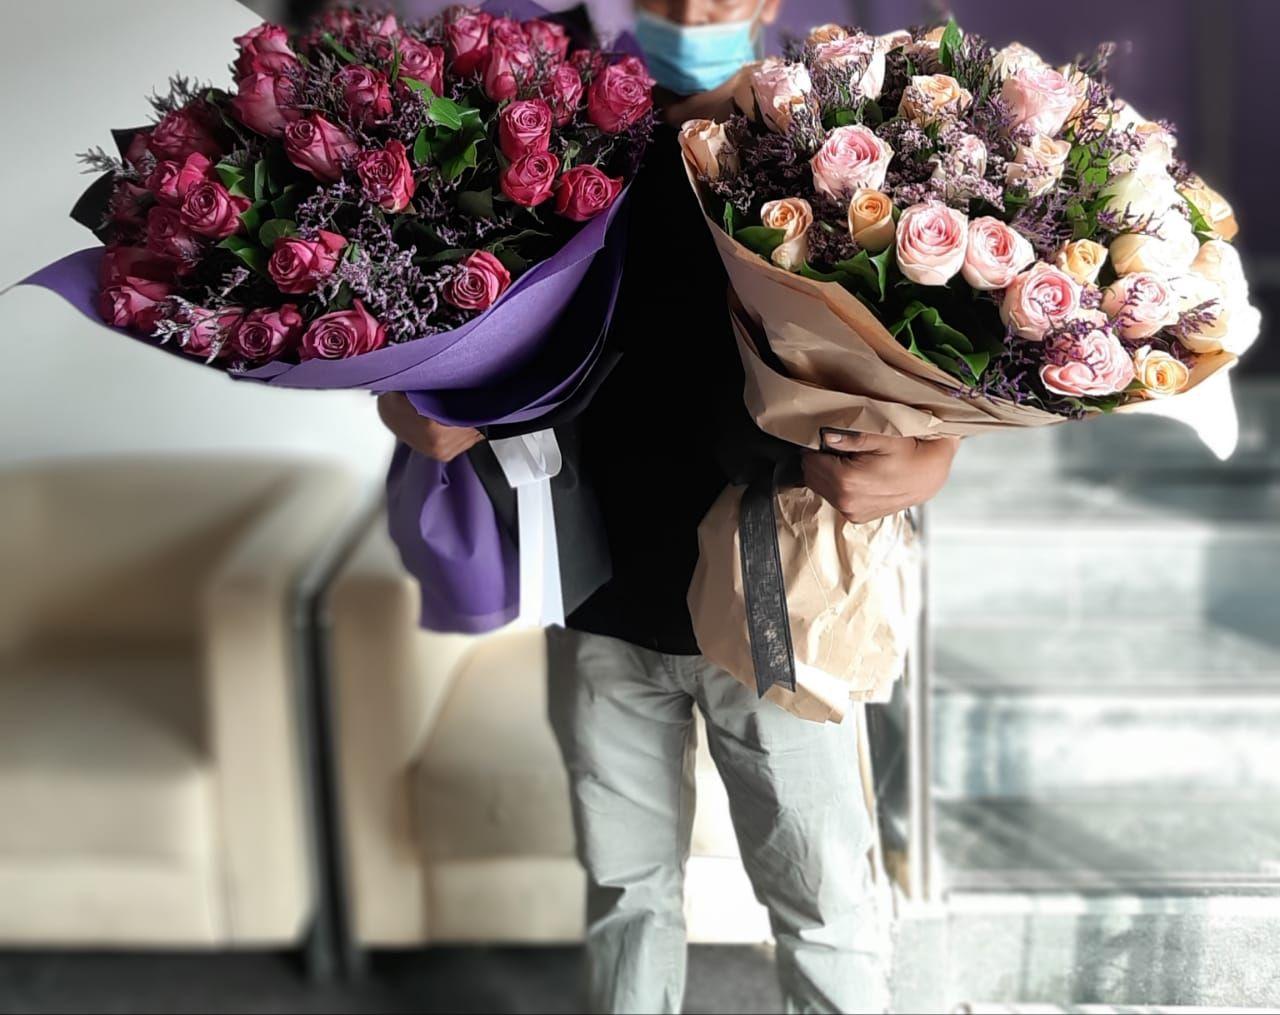 Flower Online Shop In 2020 Online Flower Shop Flower Photos Flower Template